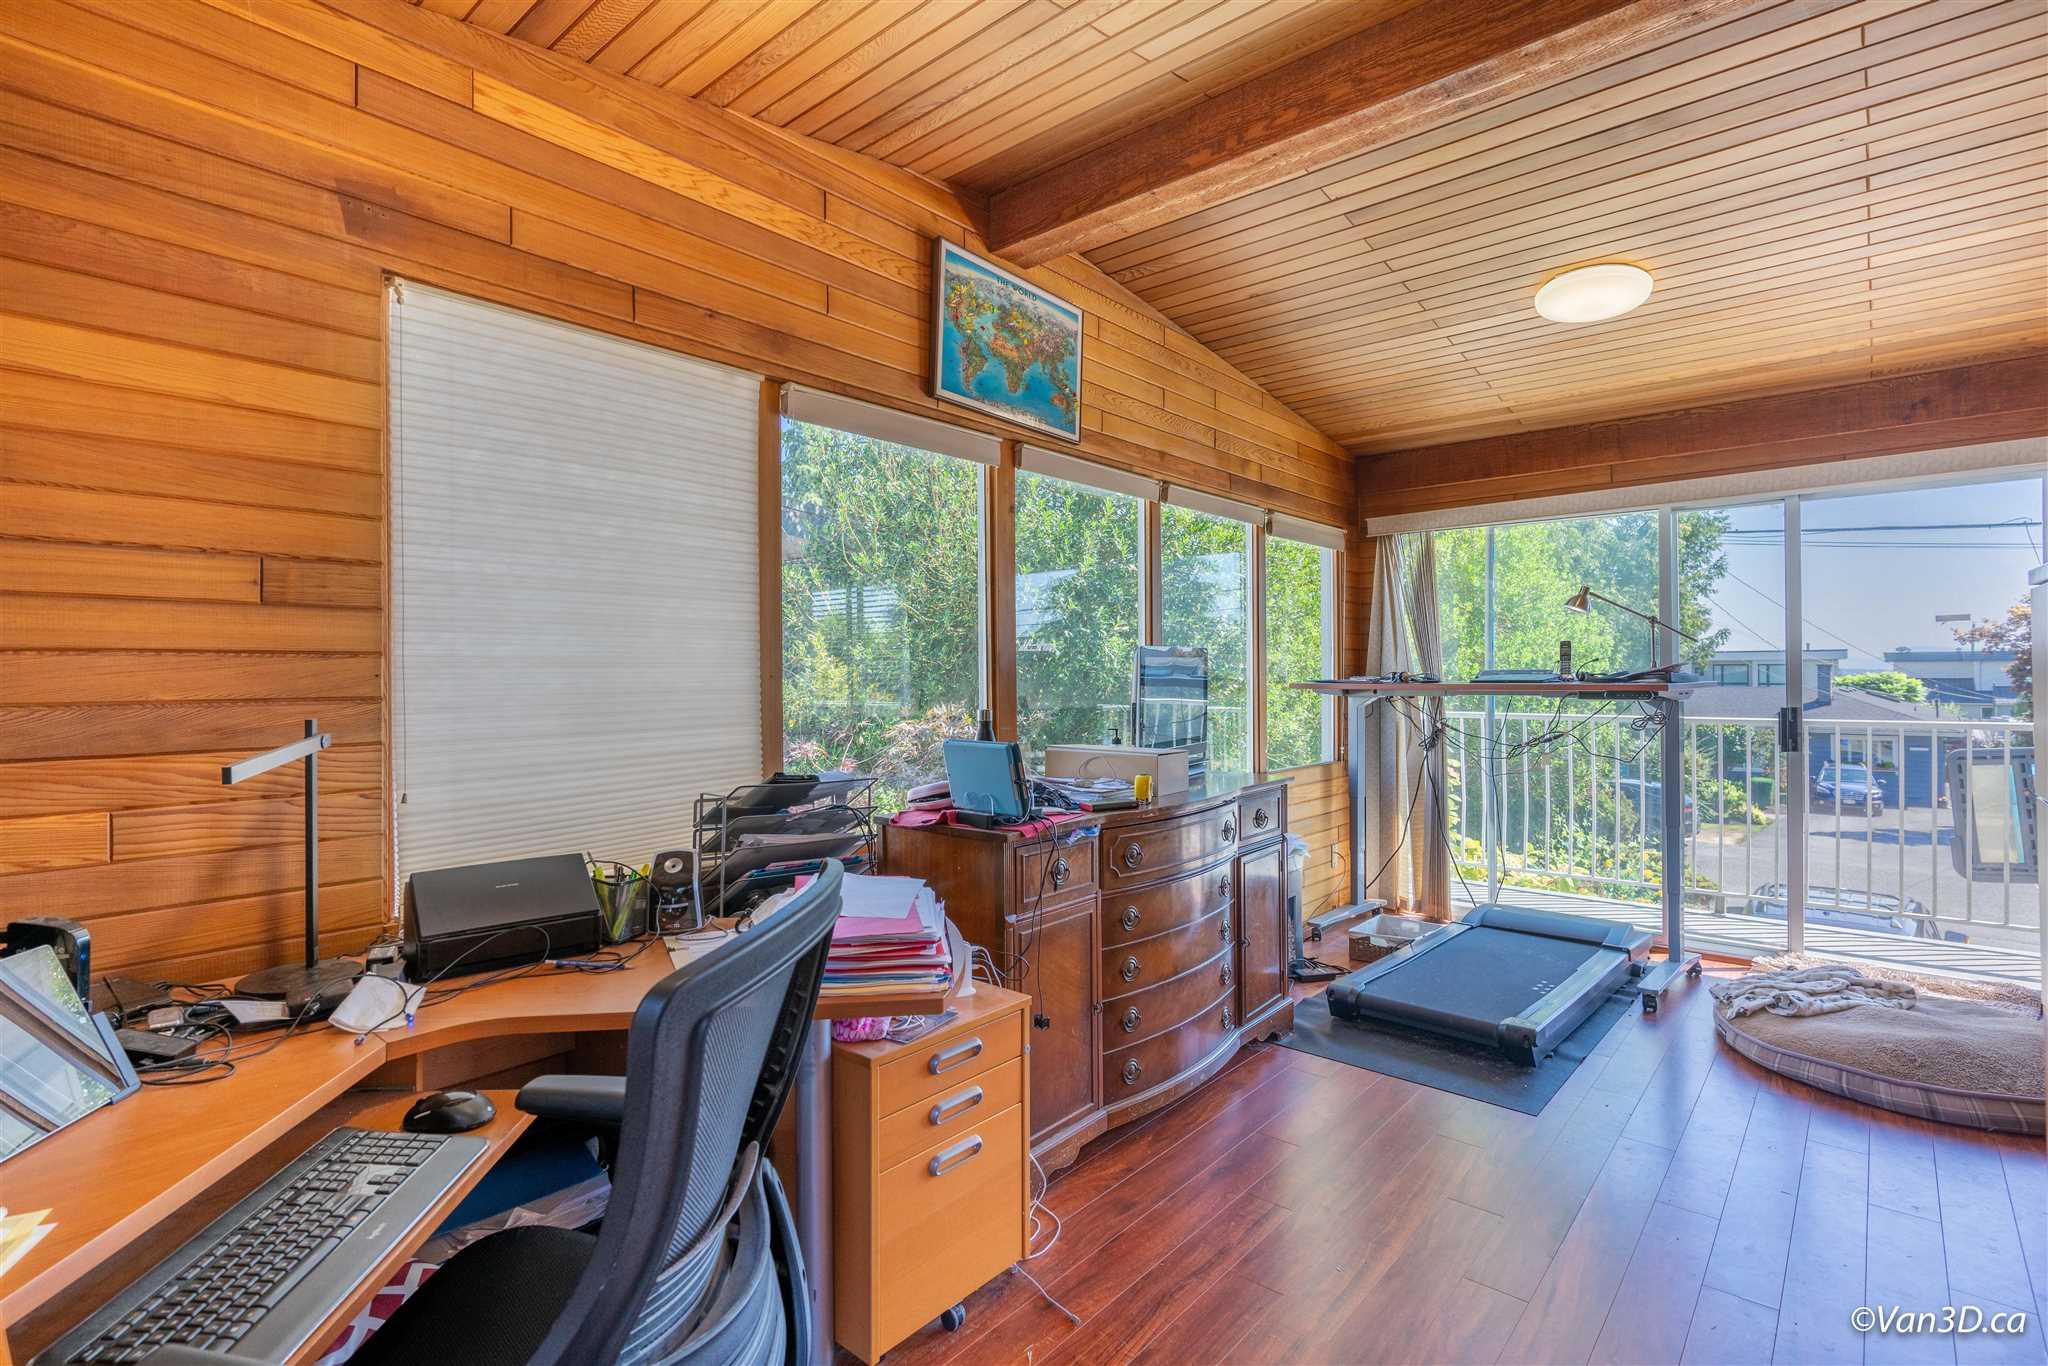 14495 MANN PARK CRESCENT - White Rock House/Single Family for sale, 4 Bedrooms (R2604561) - #26